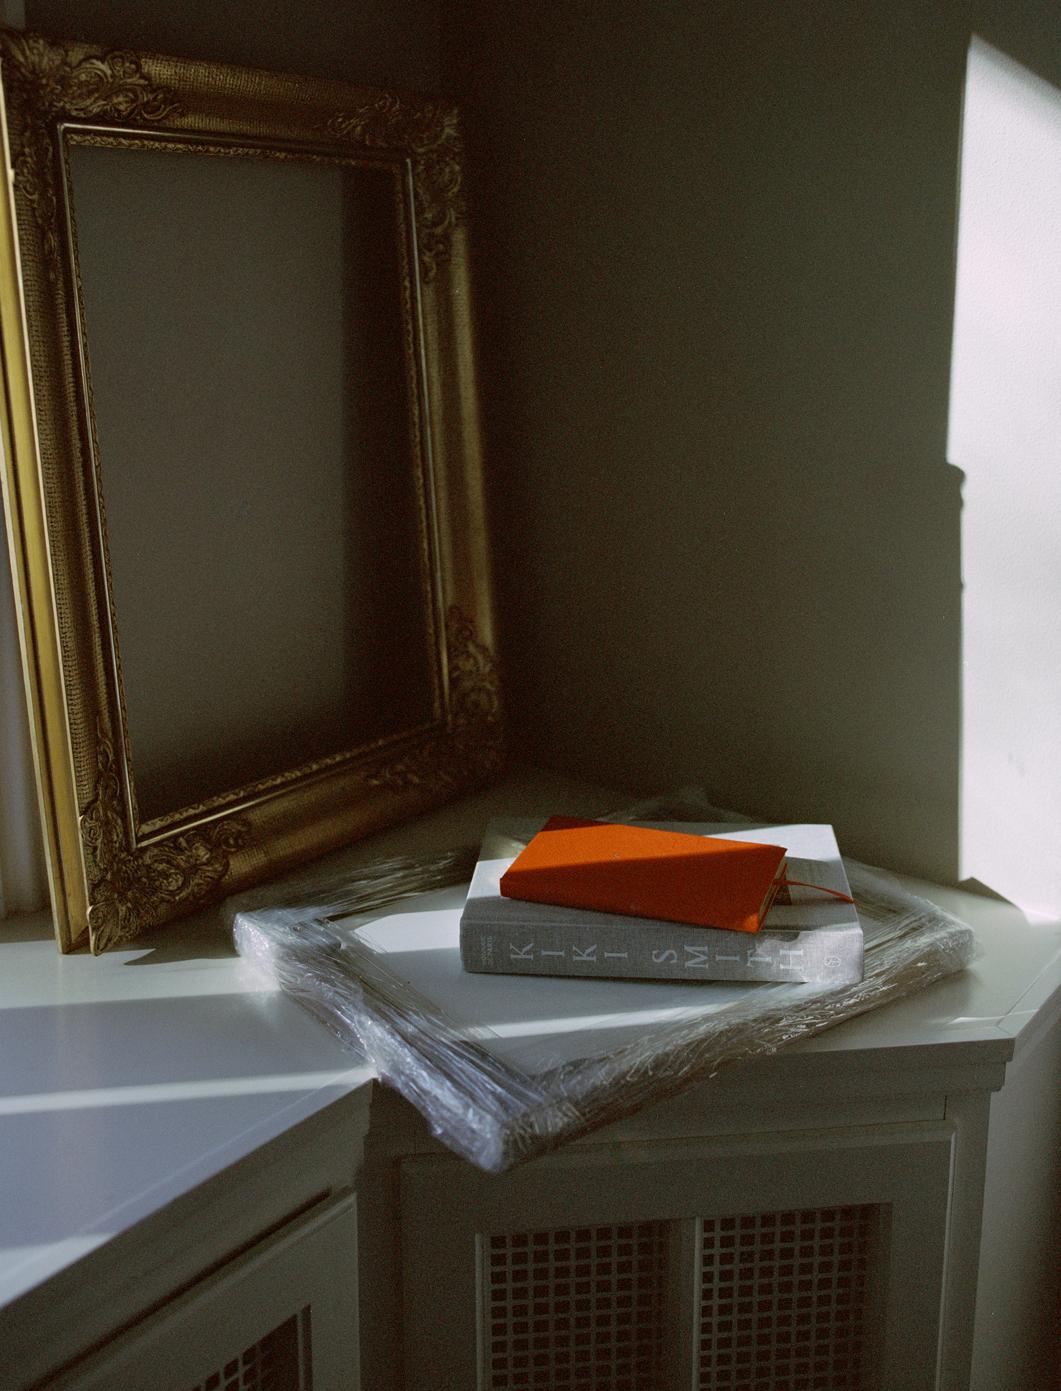 Cornelia in her showroom, photography by lorem ipsum